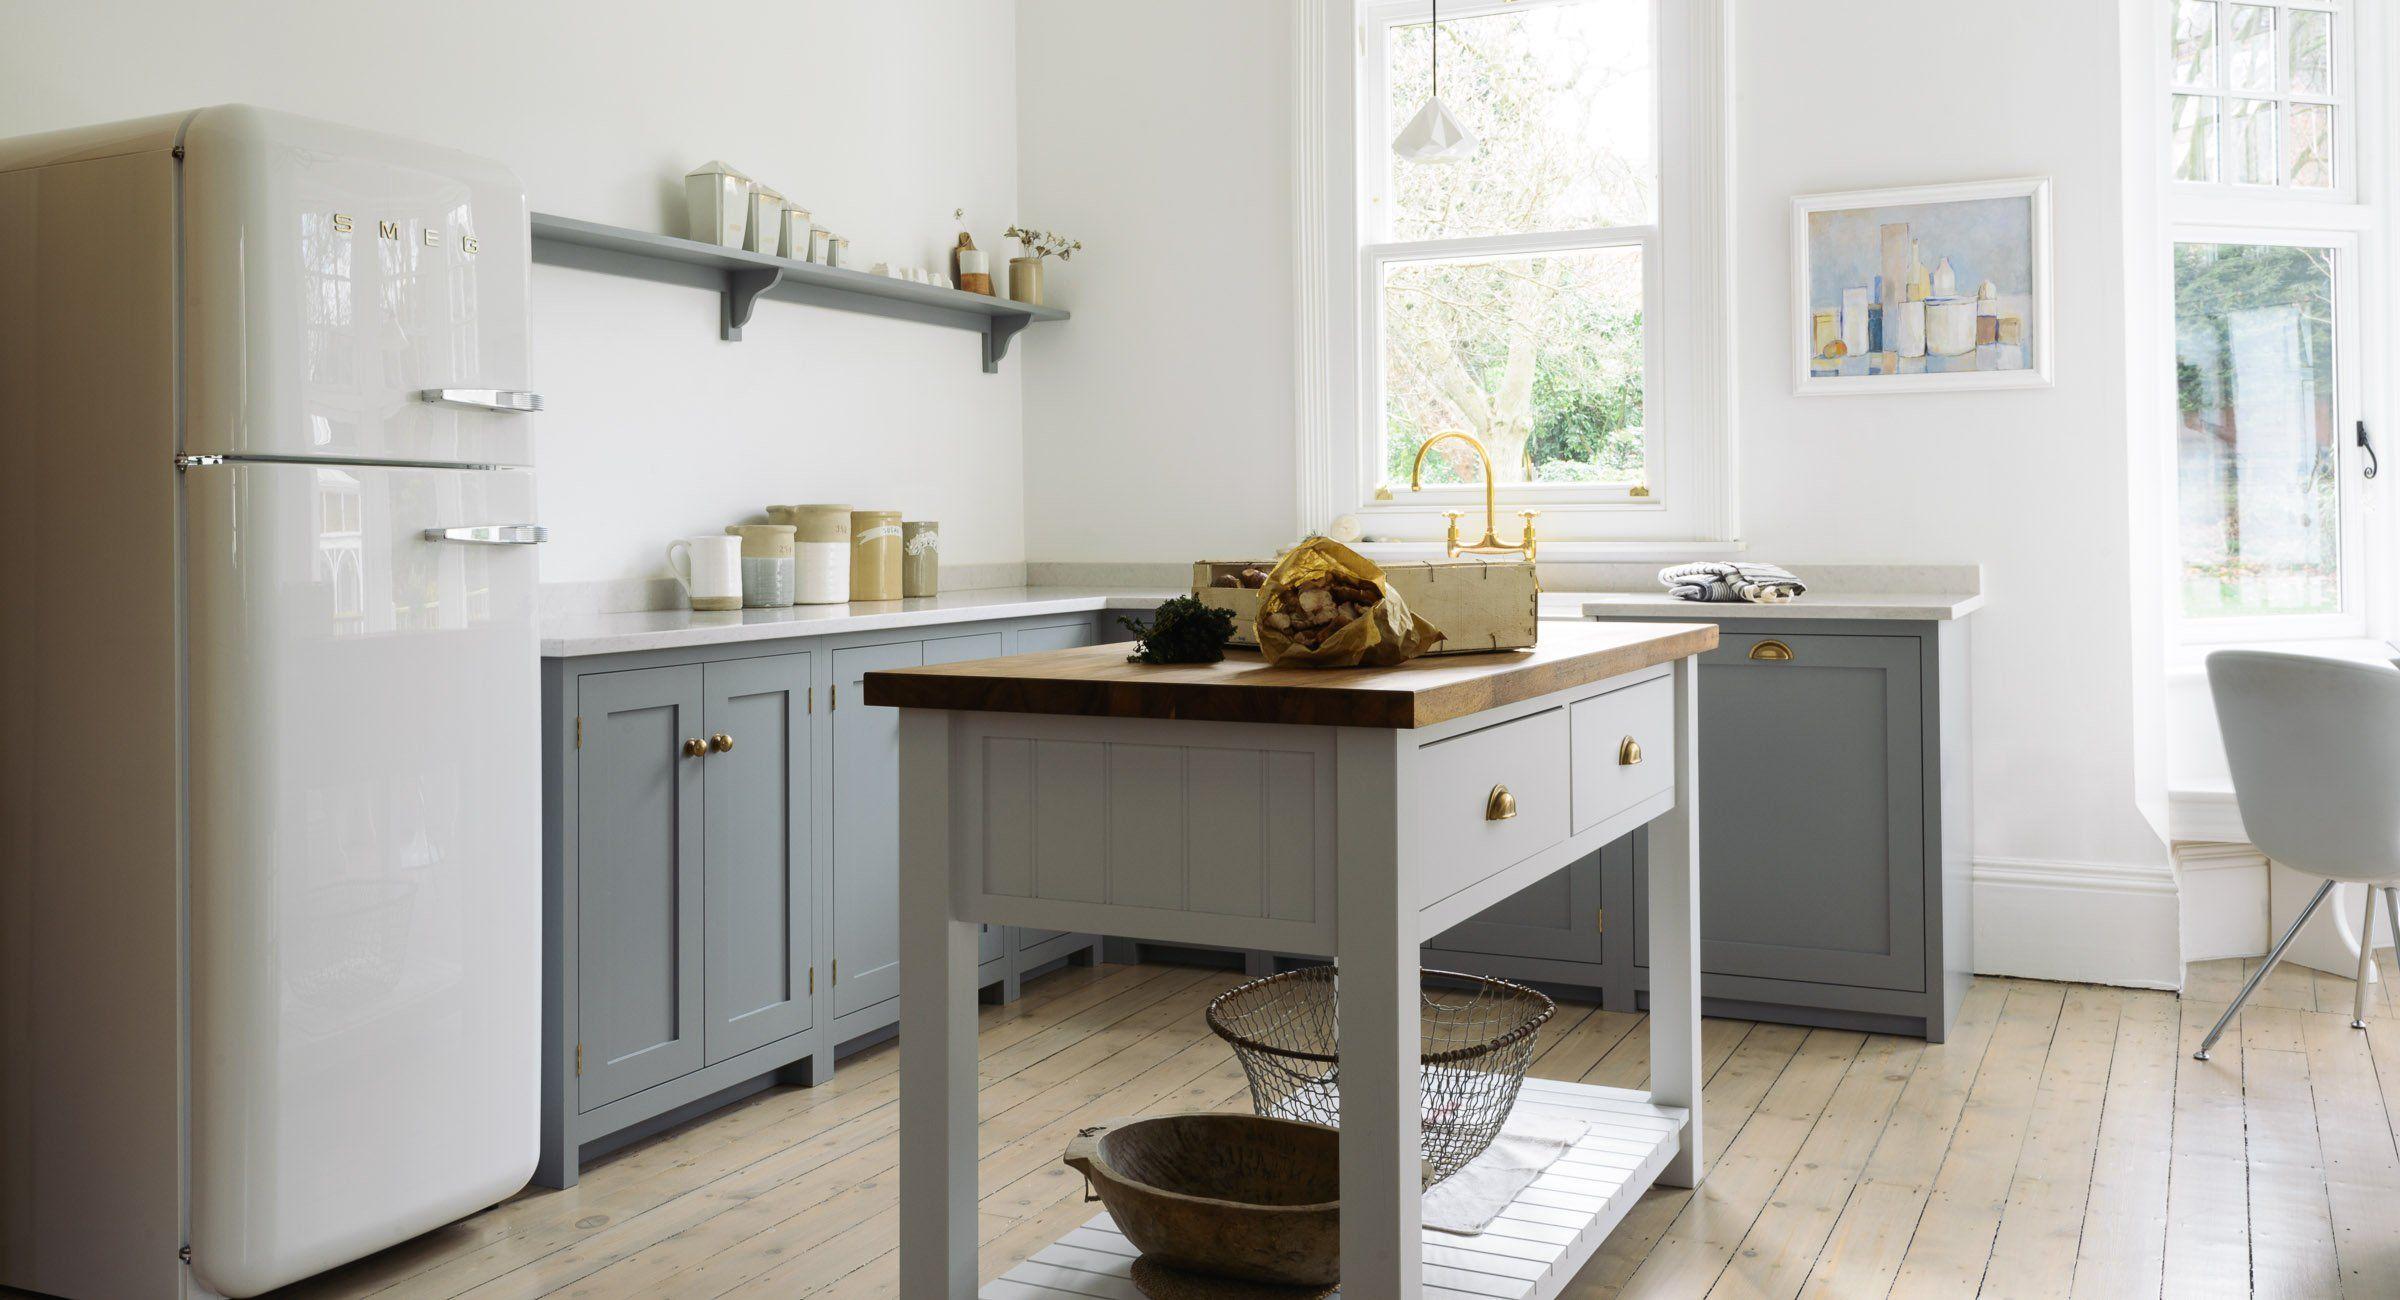 Kitchen Ideas Nottingham park kitchen nottinghamdevol kitchens | shaker cabinets, smeg